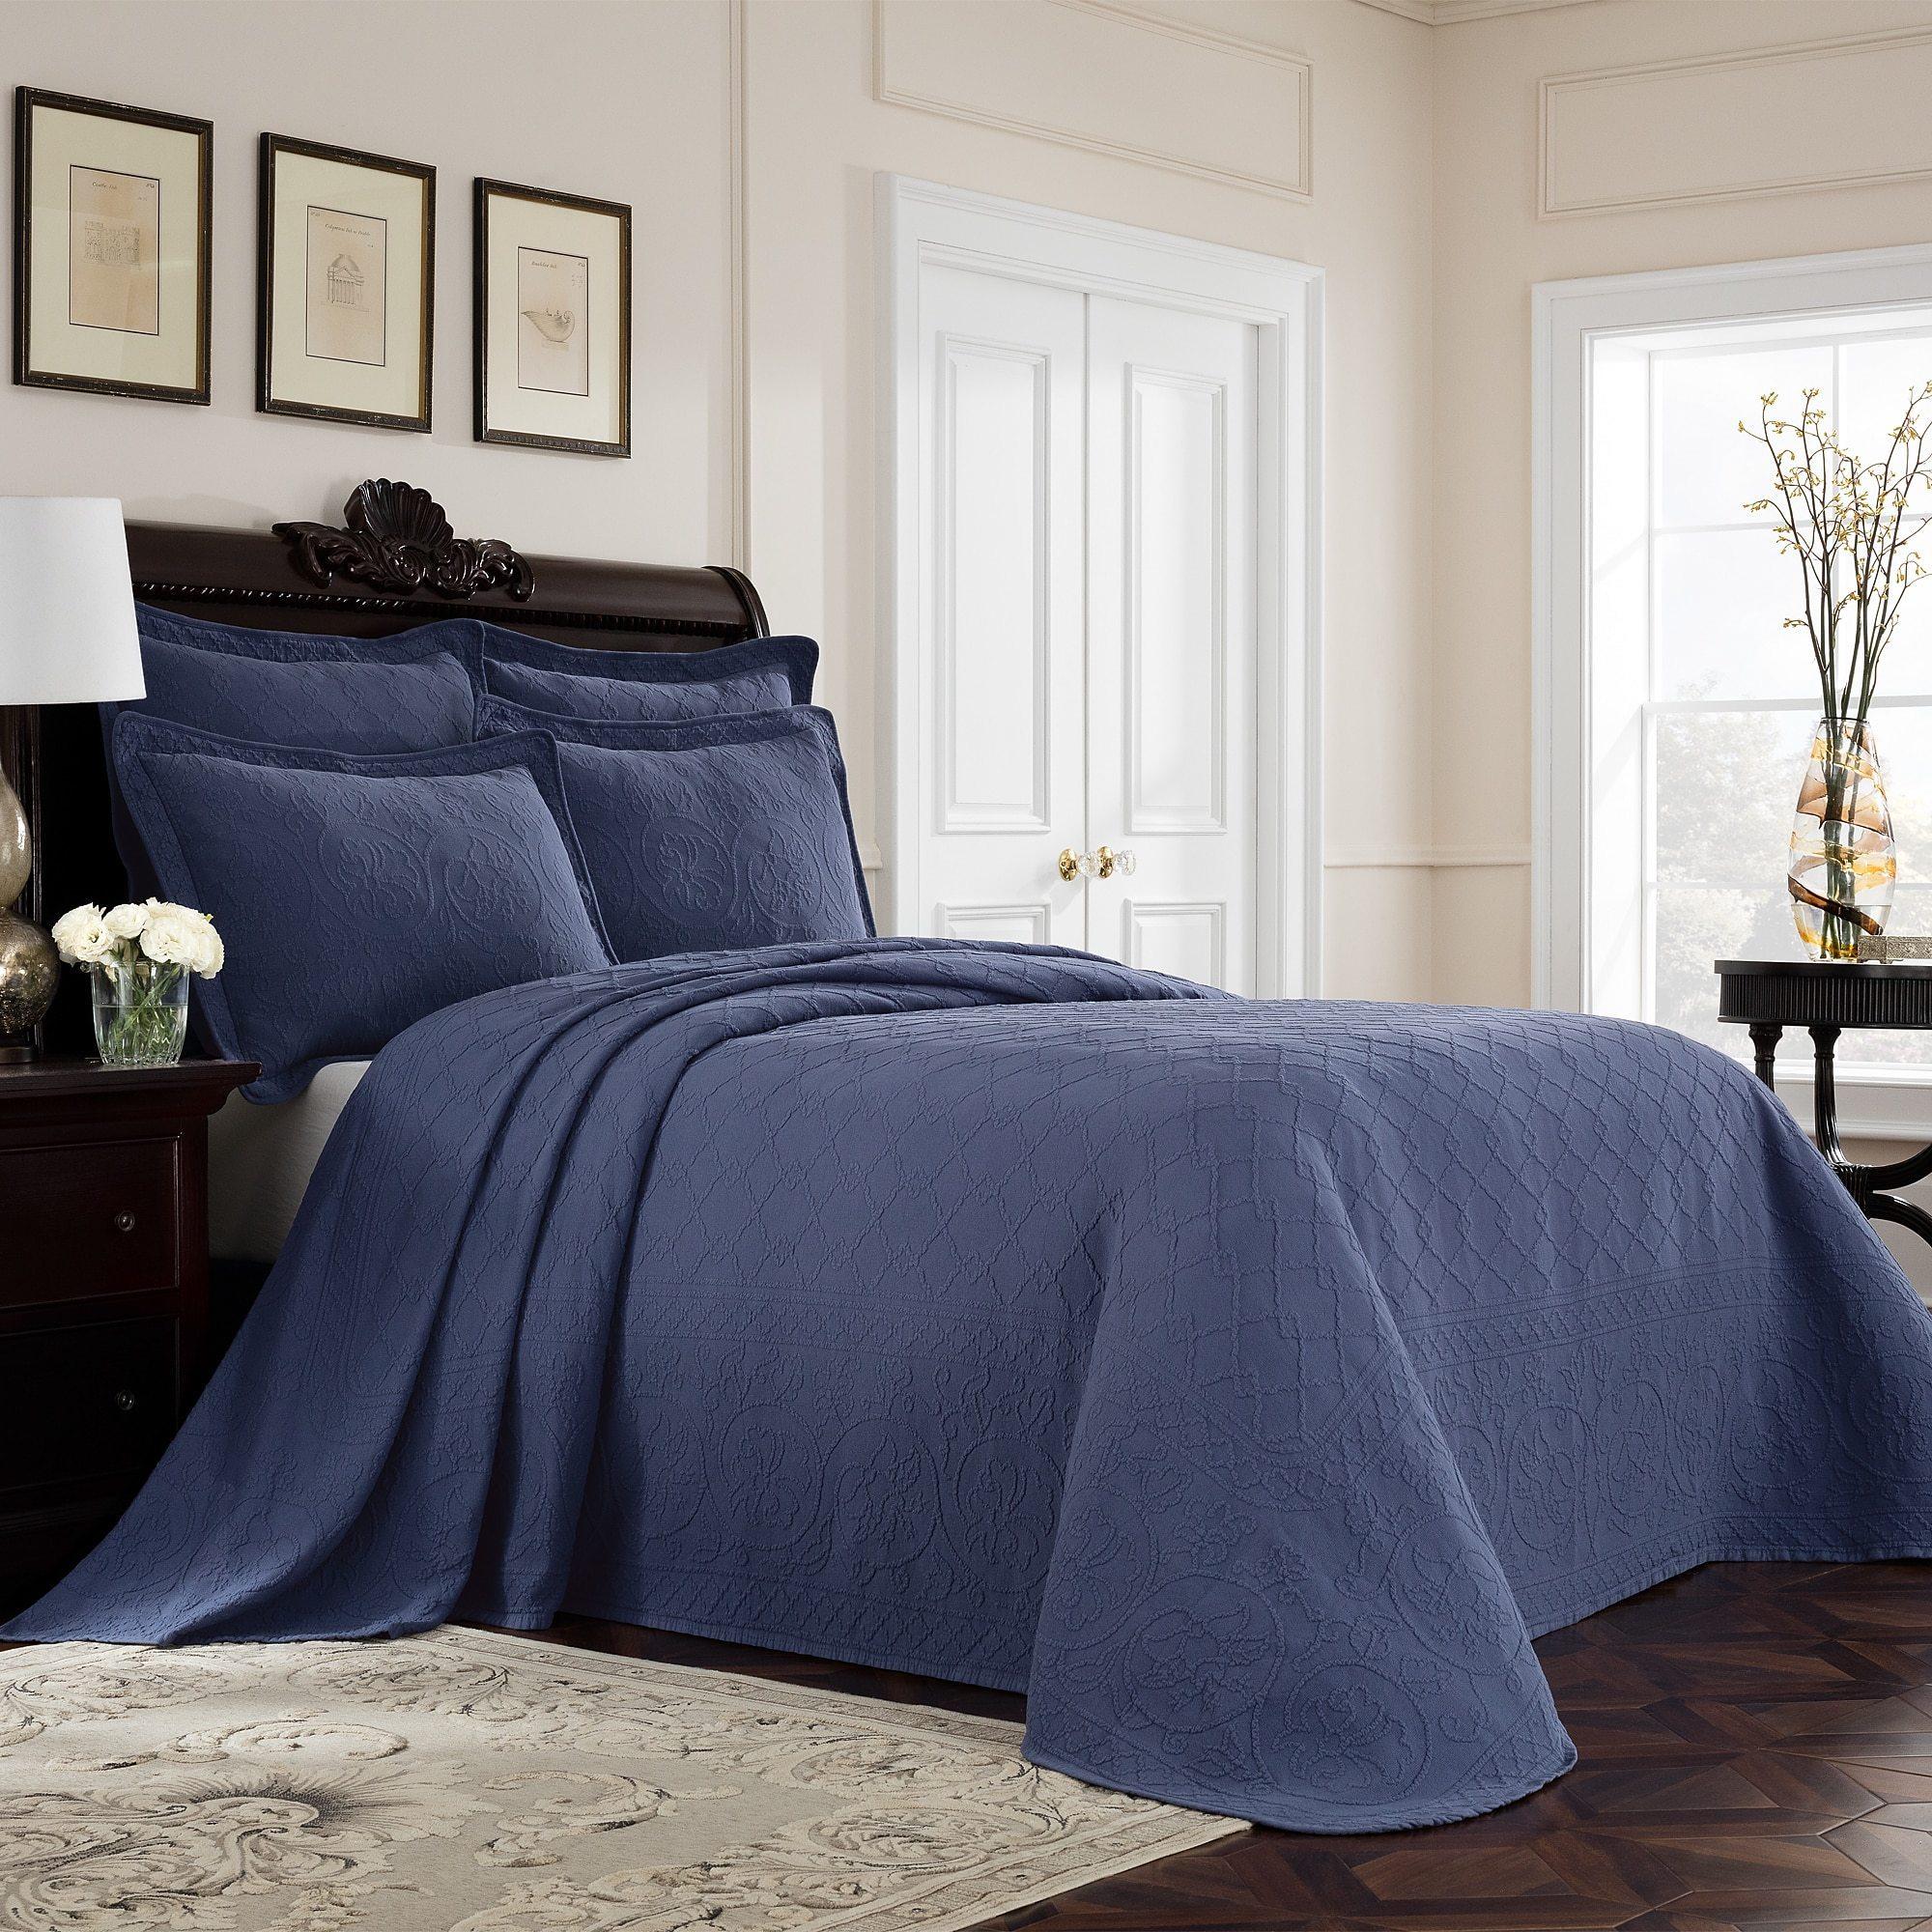 Royal Heritage Williamsburg Richmond Cotton Matelasse Bed...